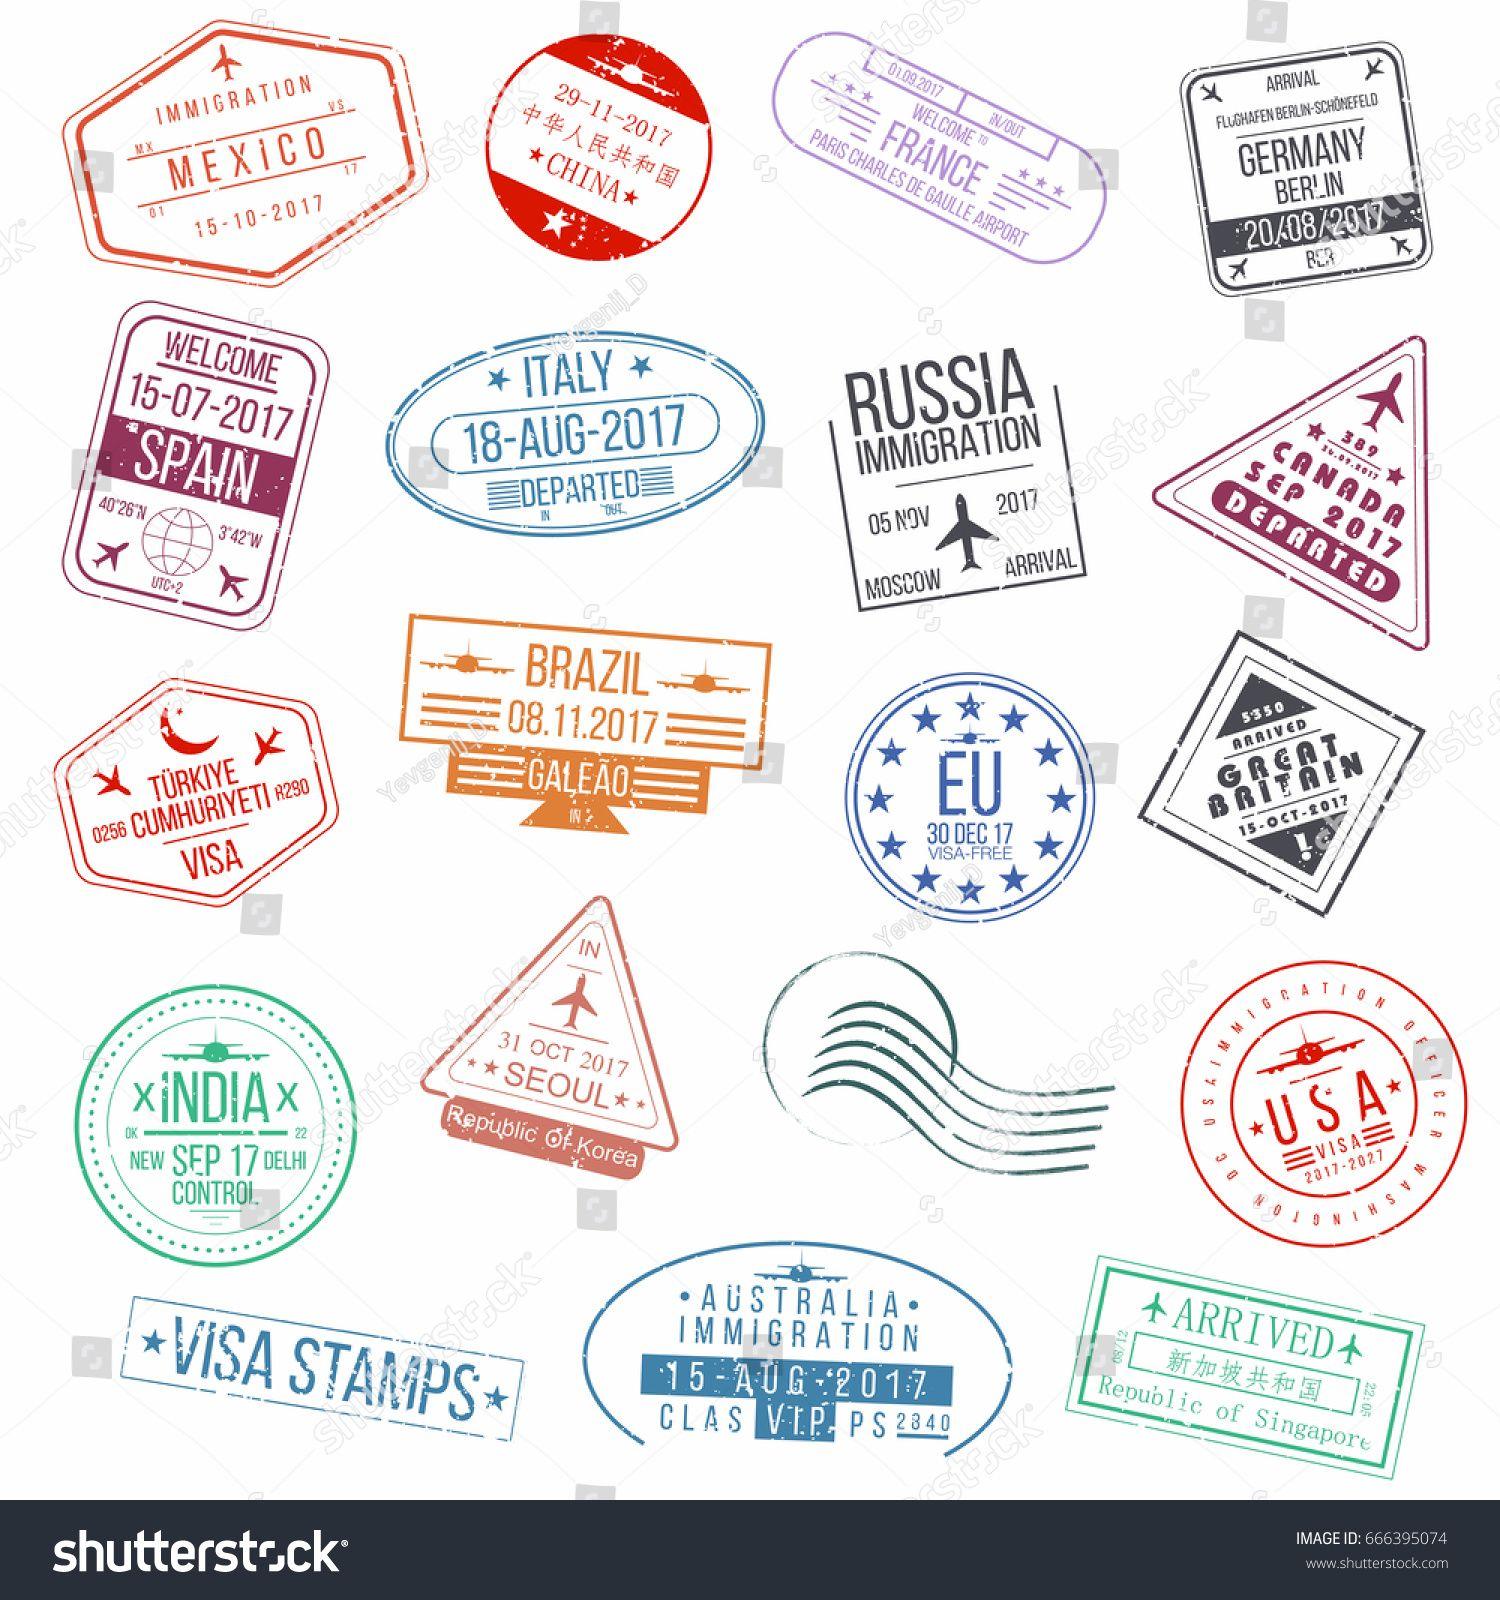 Customs at airport signage clipart stamp passport graphic Set of visa passport stamps. International arrivals sign ... graphic